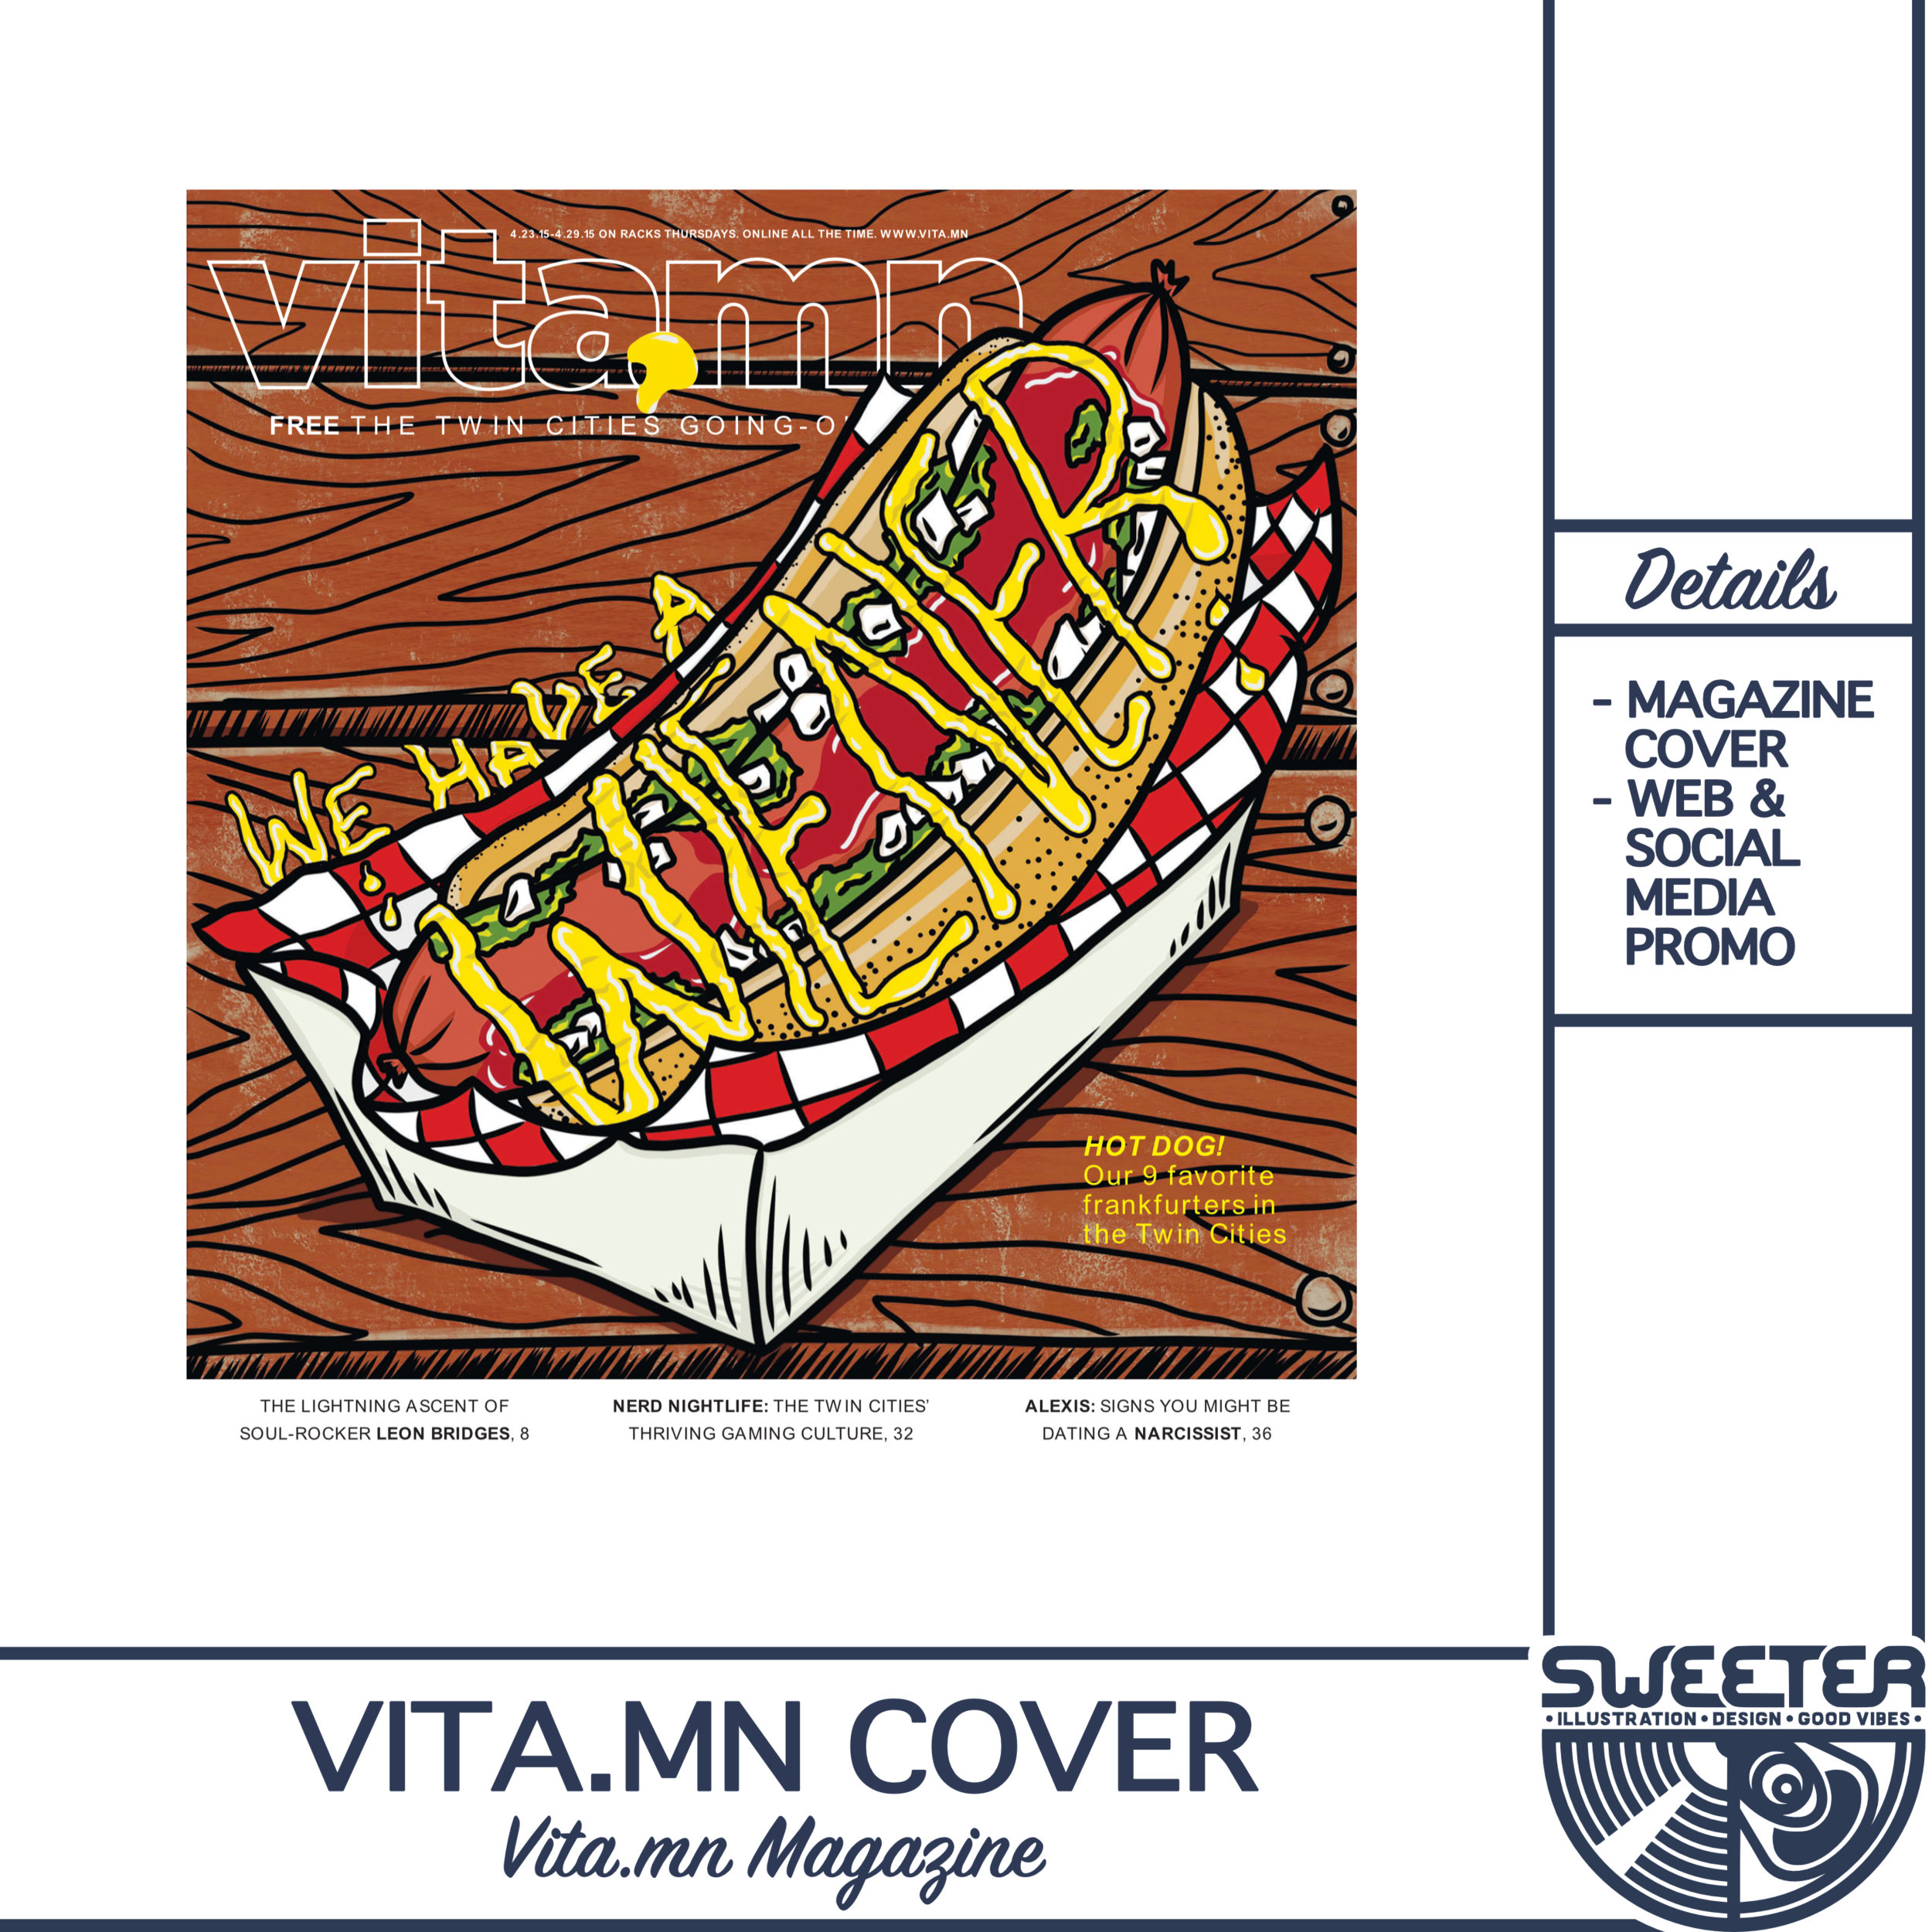 PORTFOLIO - VITAMN COVER.png